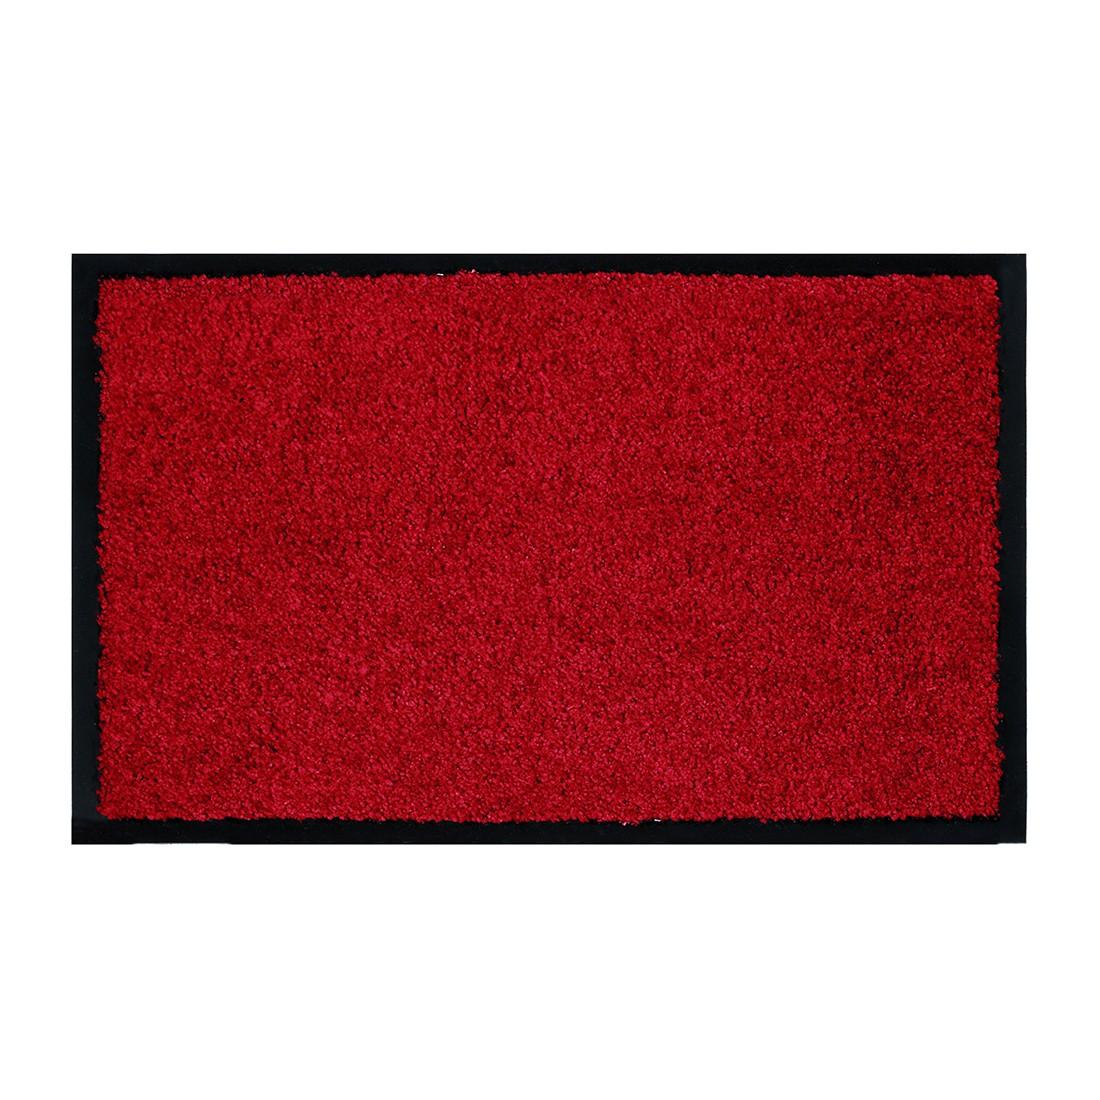 Fußmatte Proper Tex - Rot - 120 x 180 cm, Astra